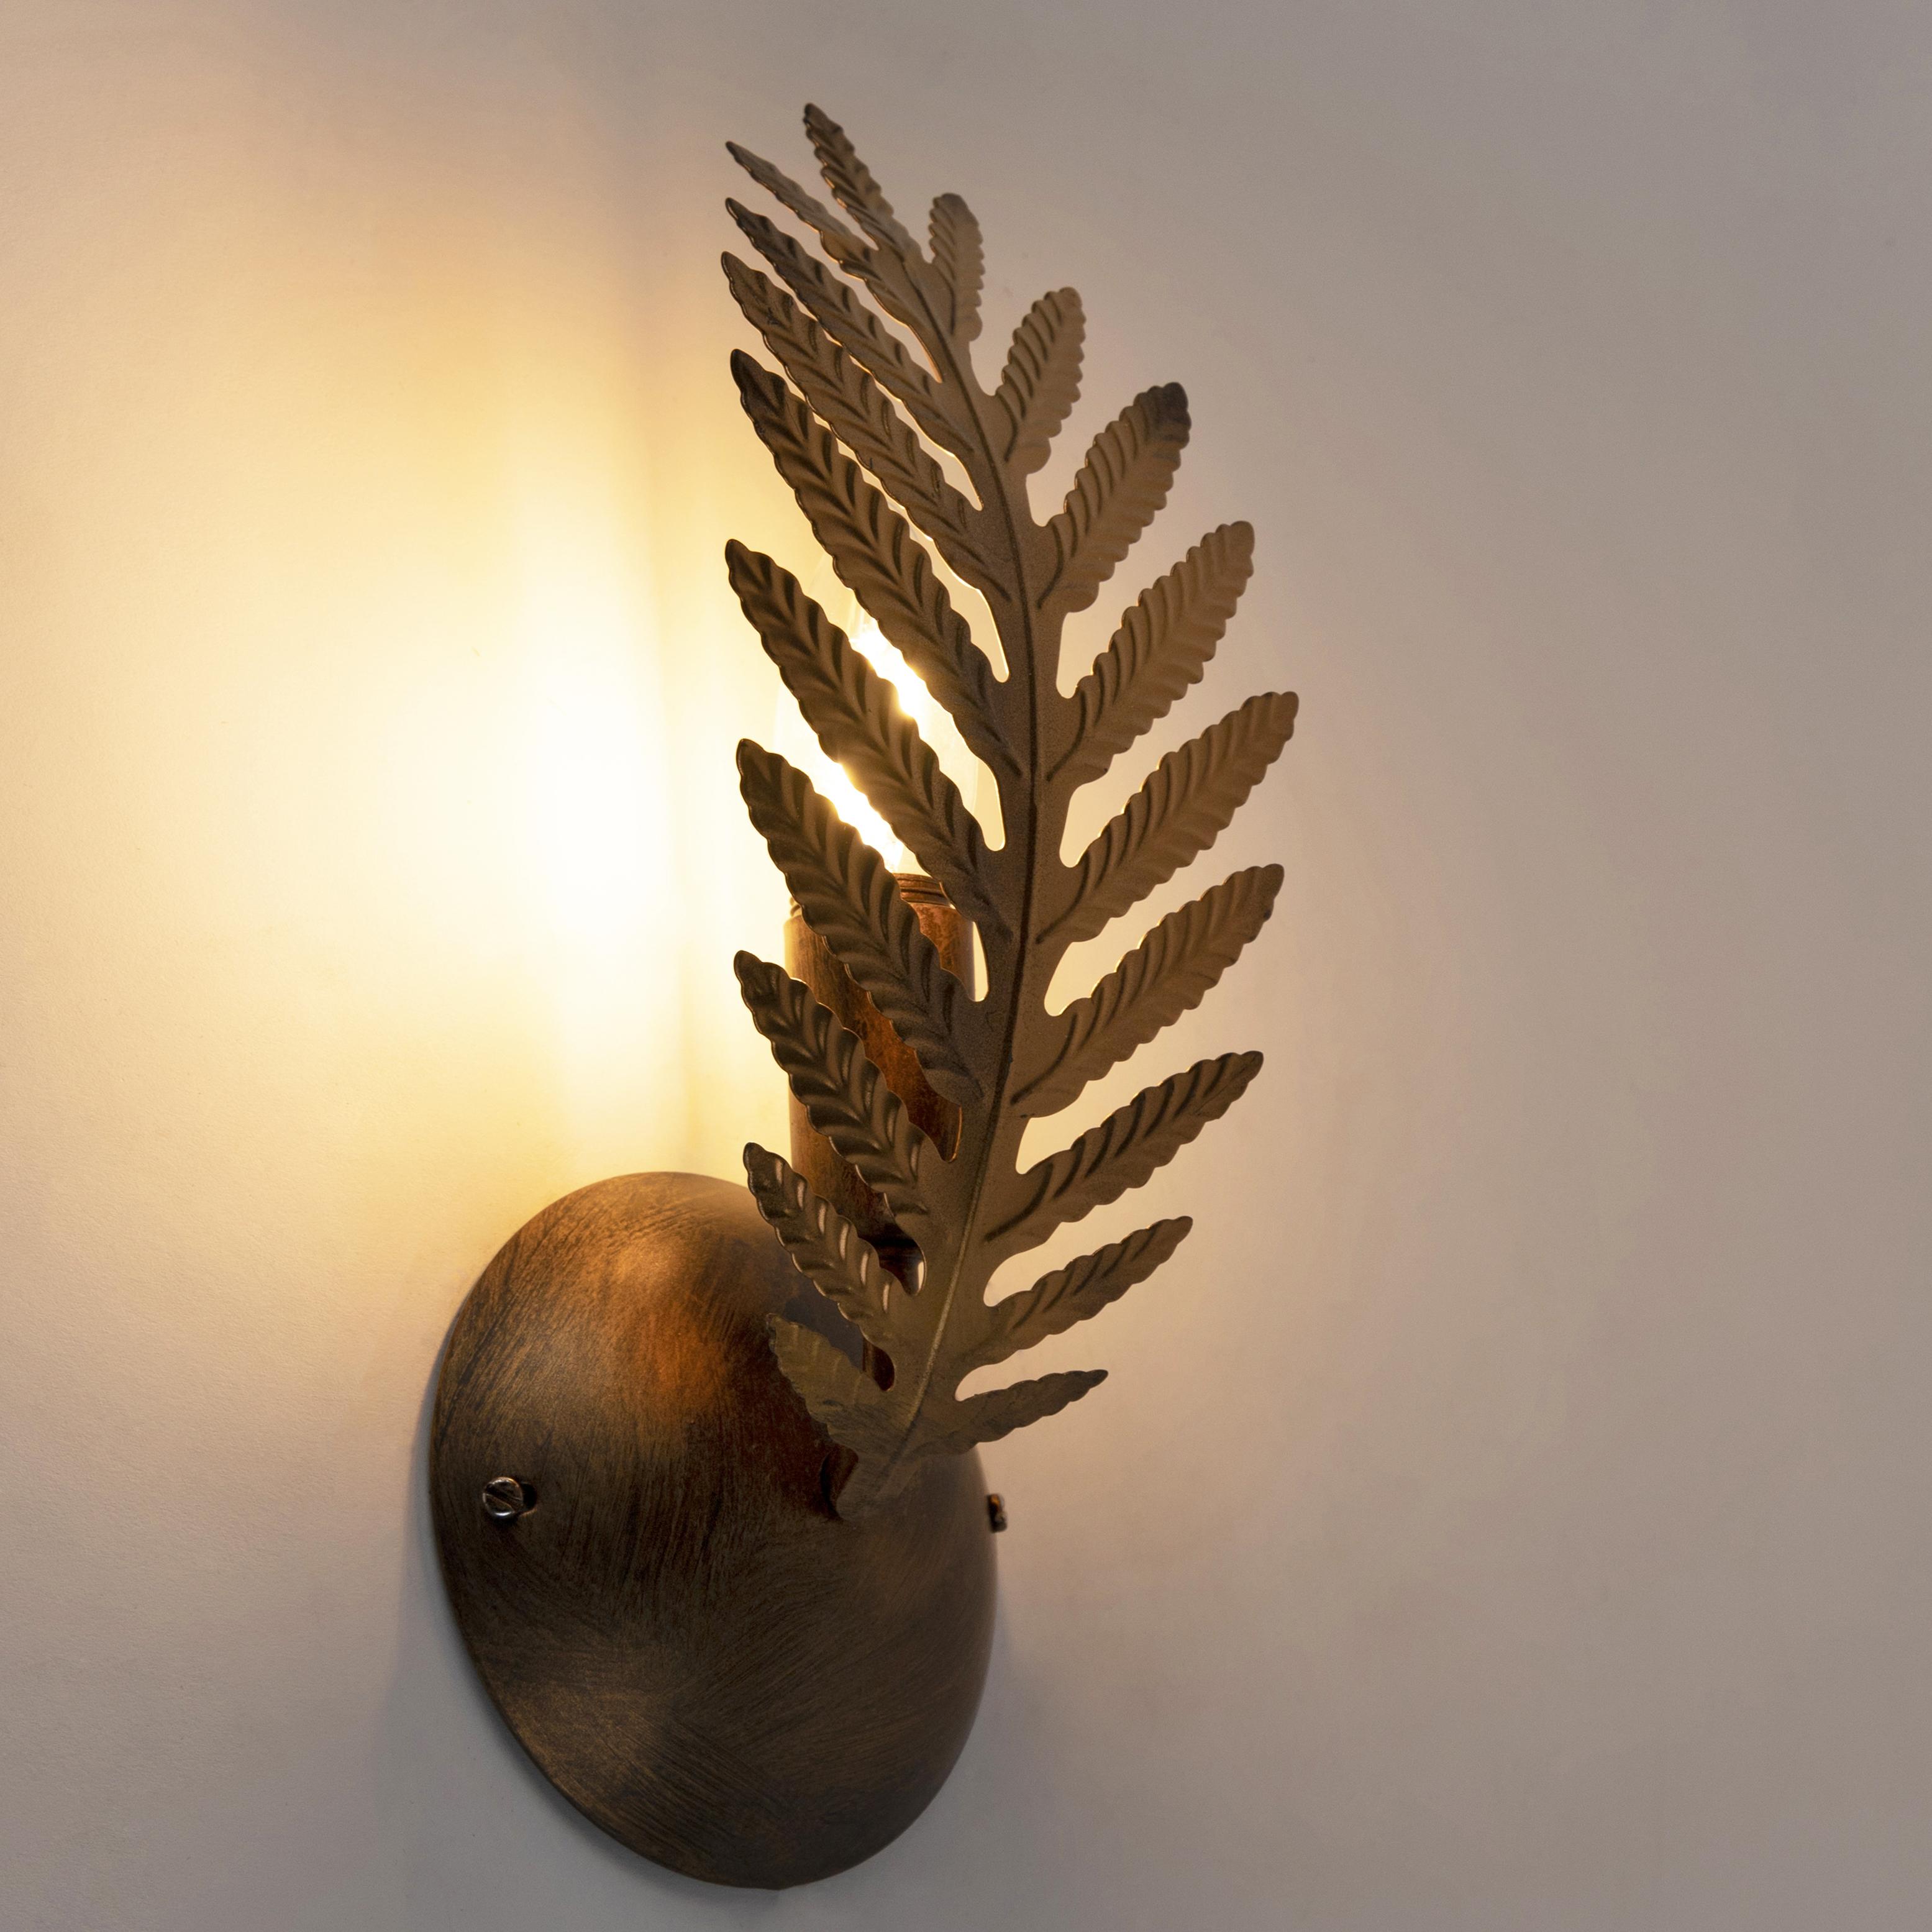 Vintage wandlamp goud - Botanica